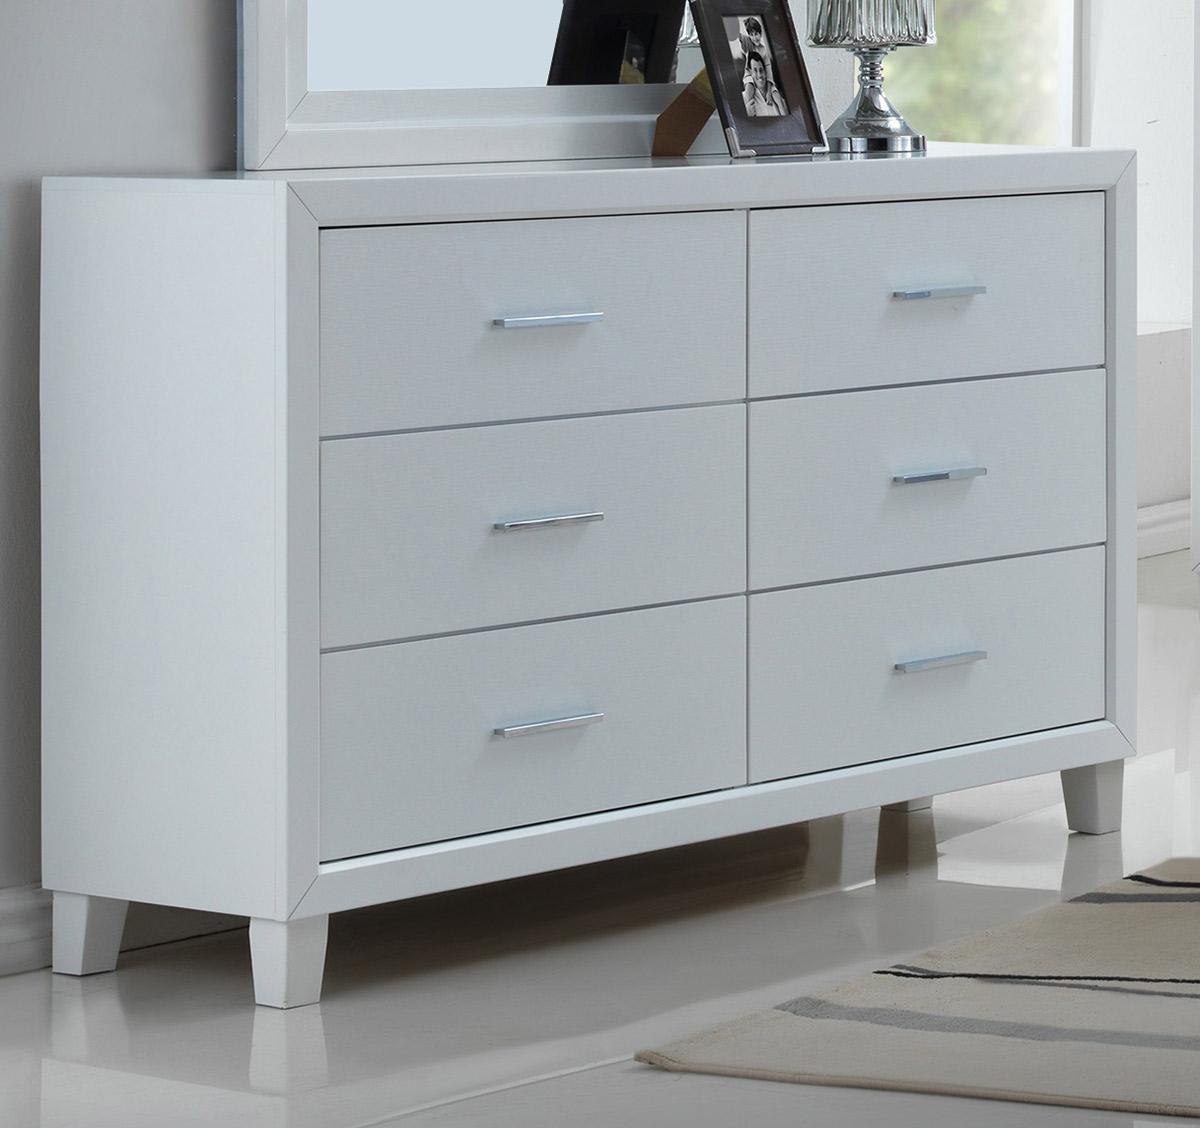 Acme Switzer Dresser - White